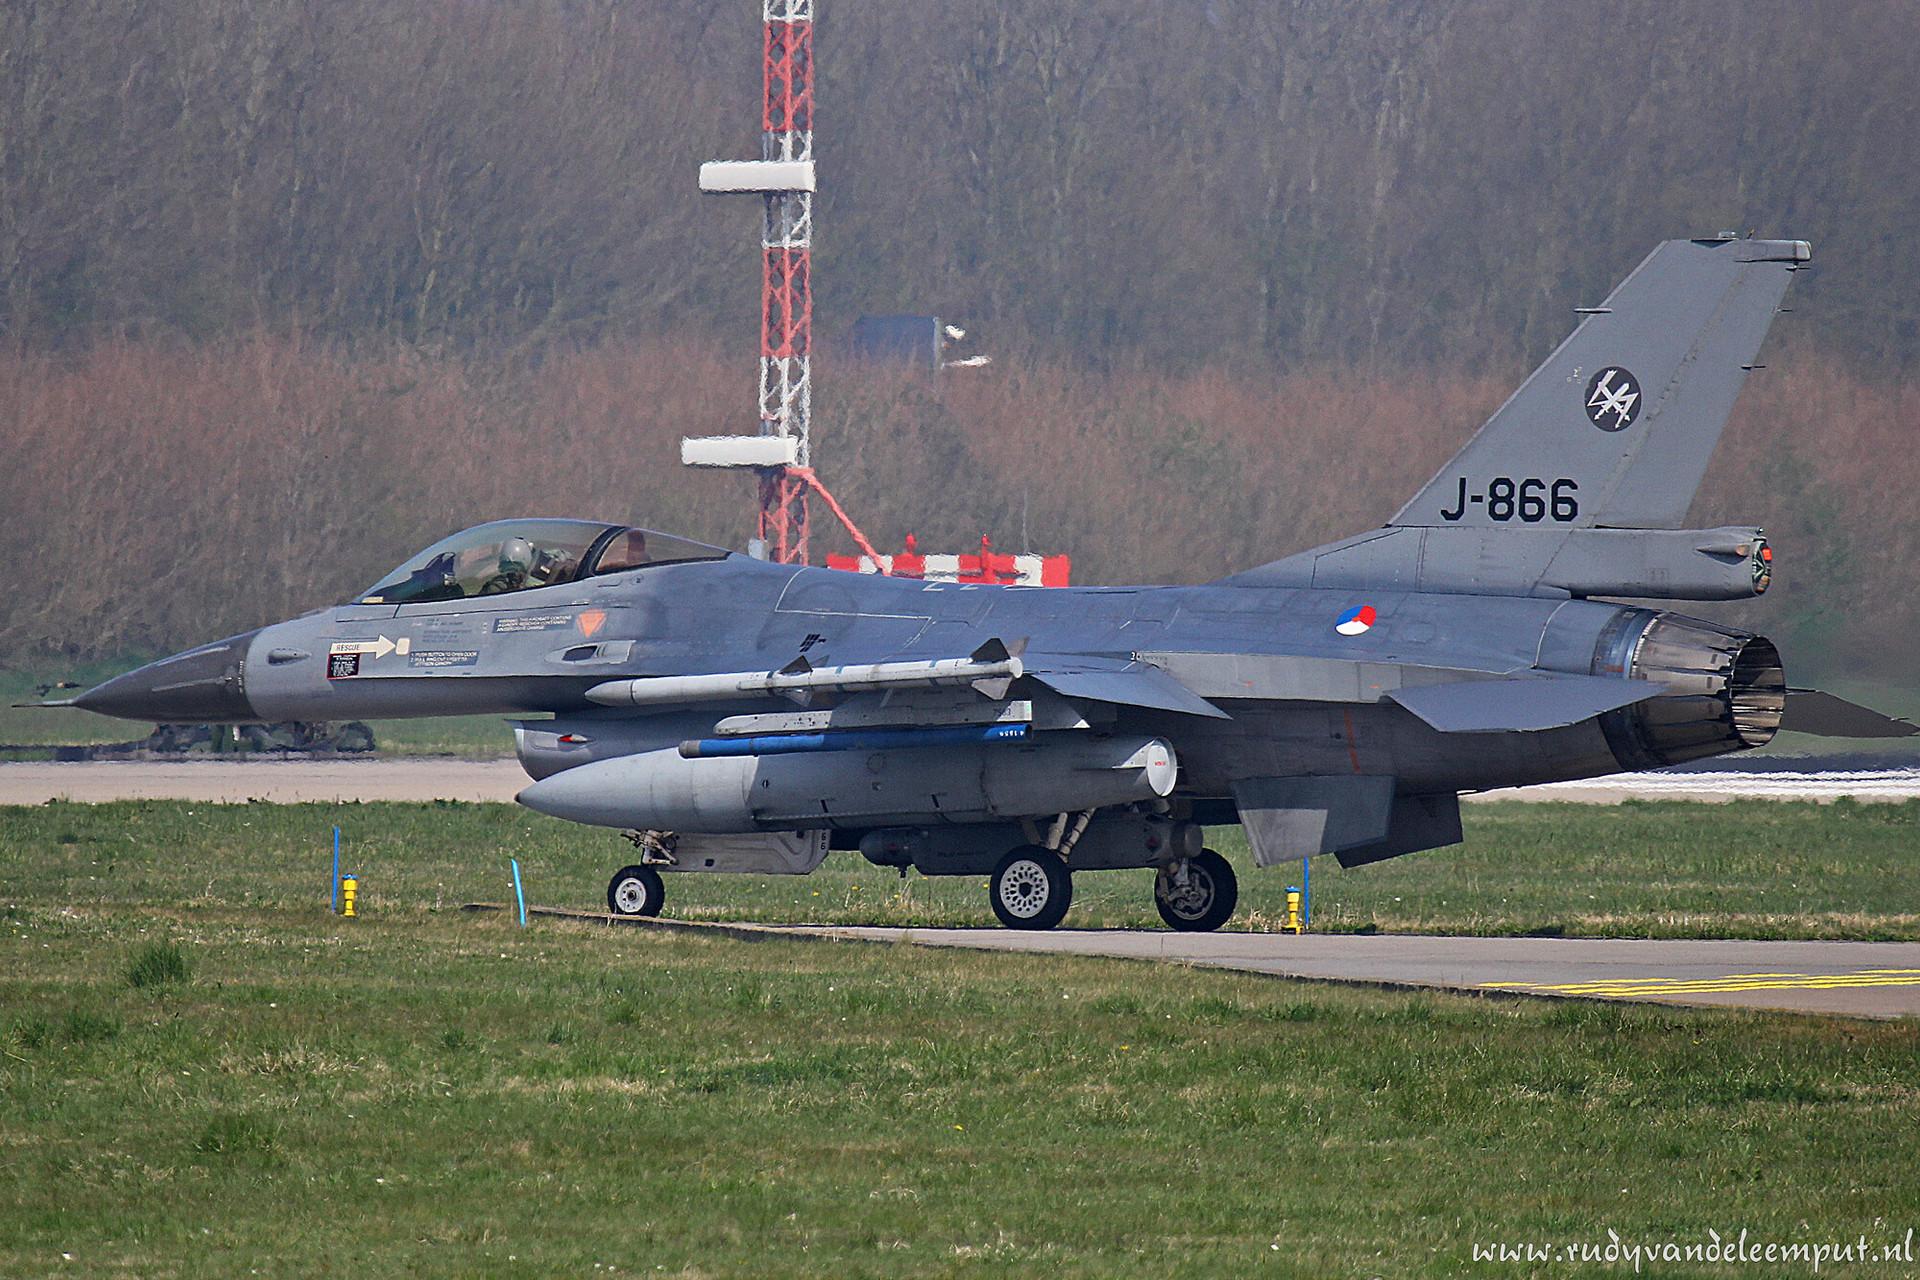 J-866   Build: 1984 - General Dynamics F-16 A Fighting Falcon